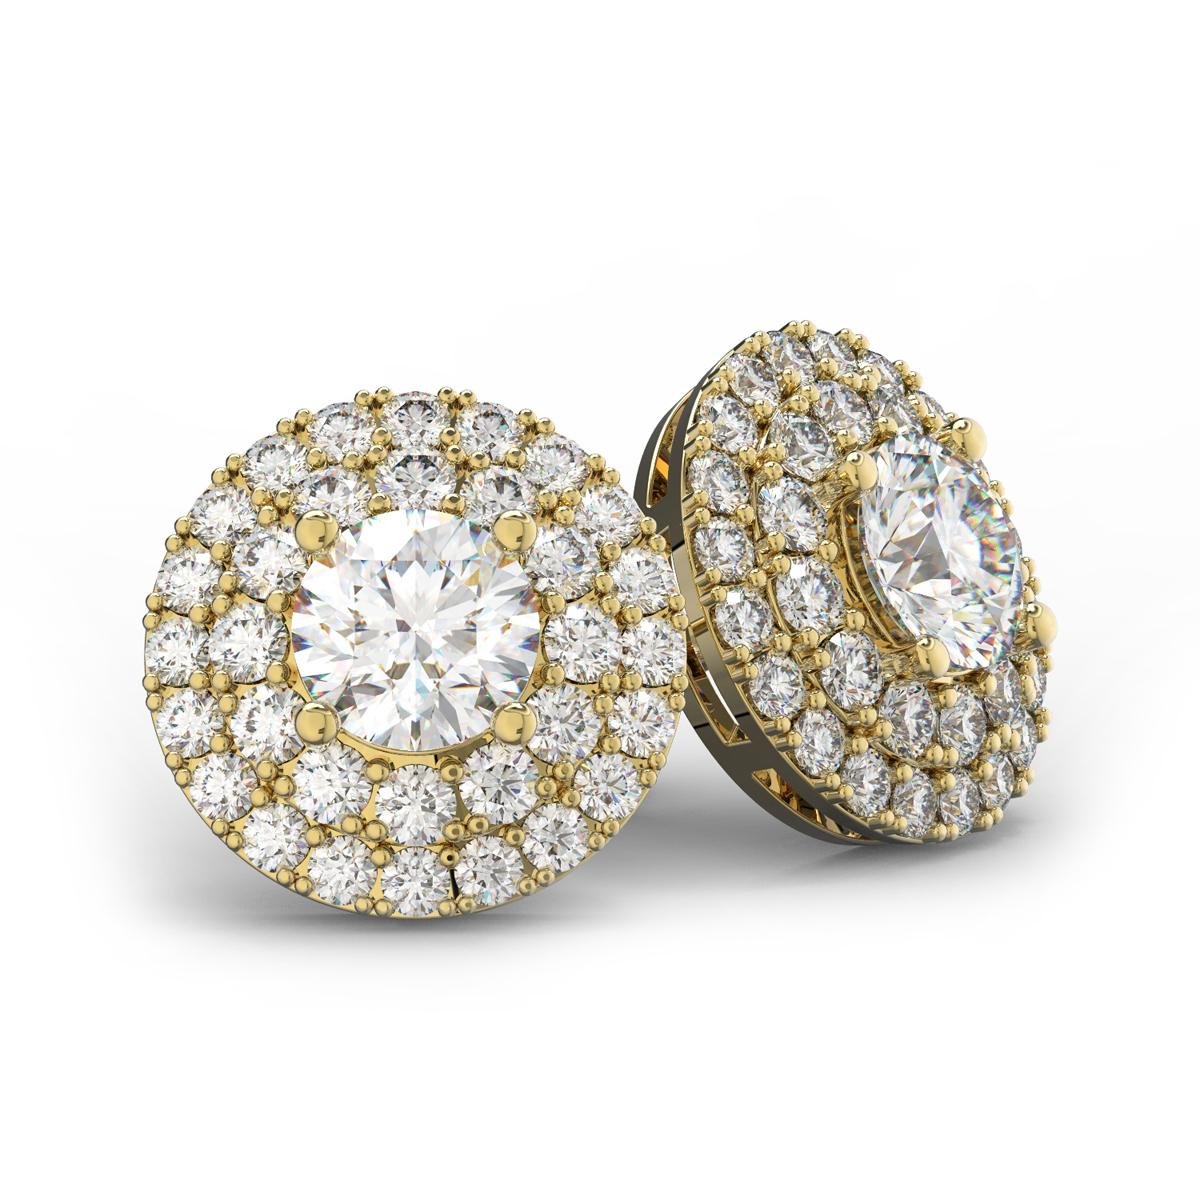 14K Yellow Gold 3 Carat Diamond Halo Stud Earrings